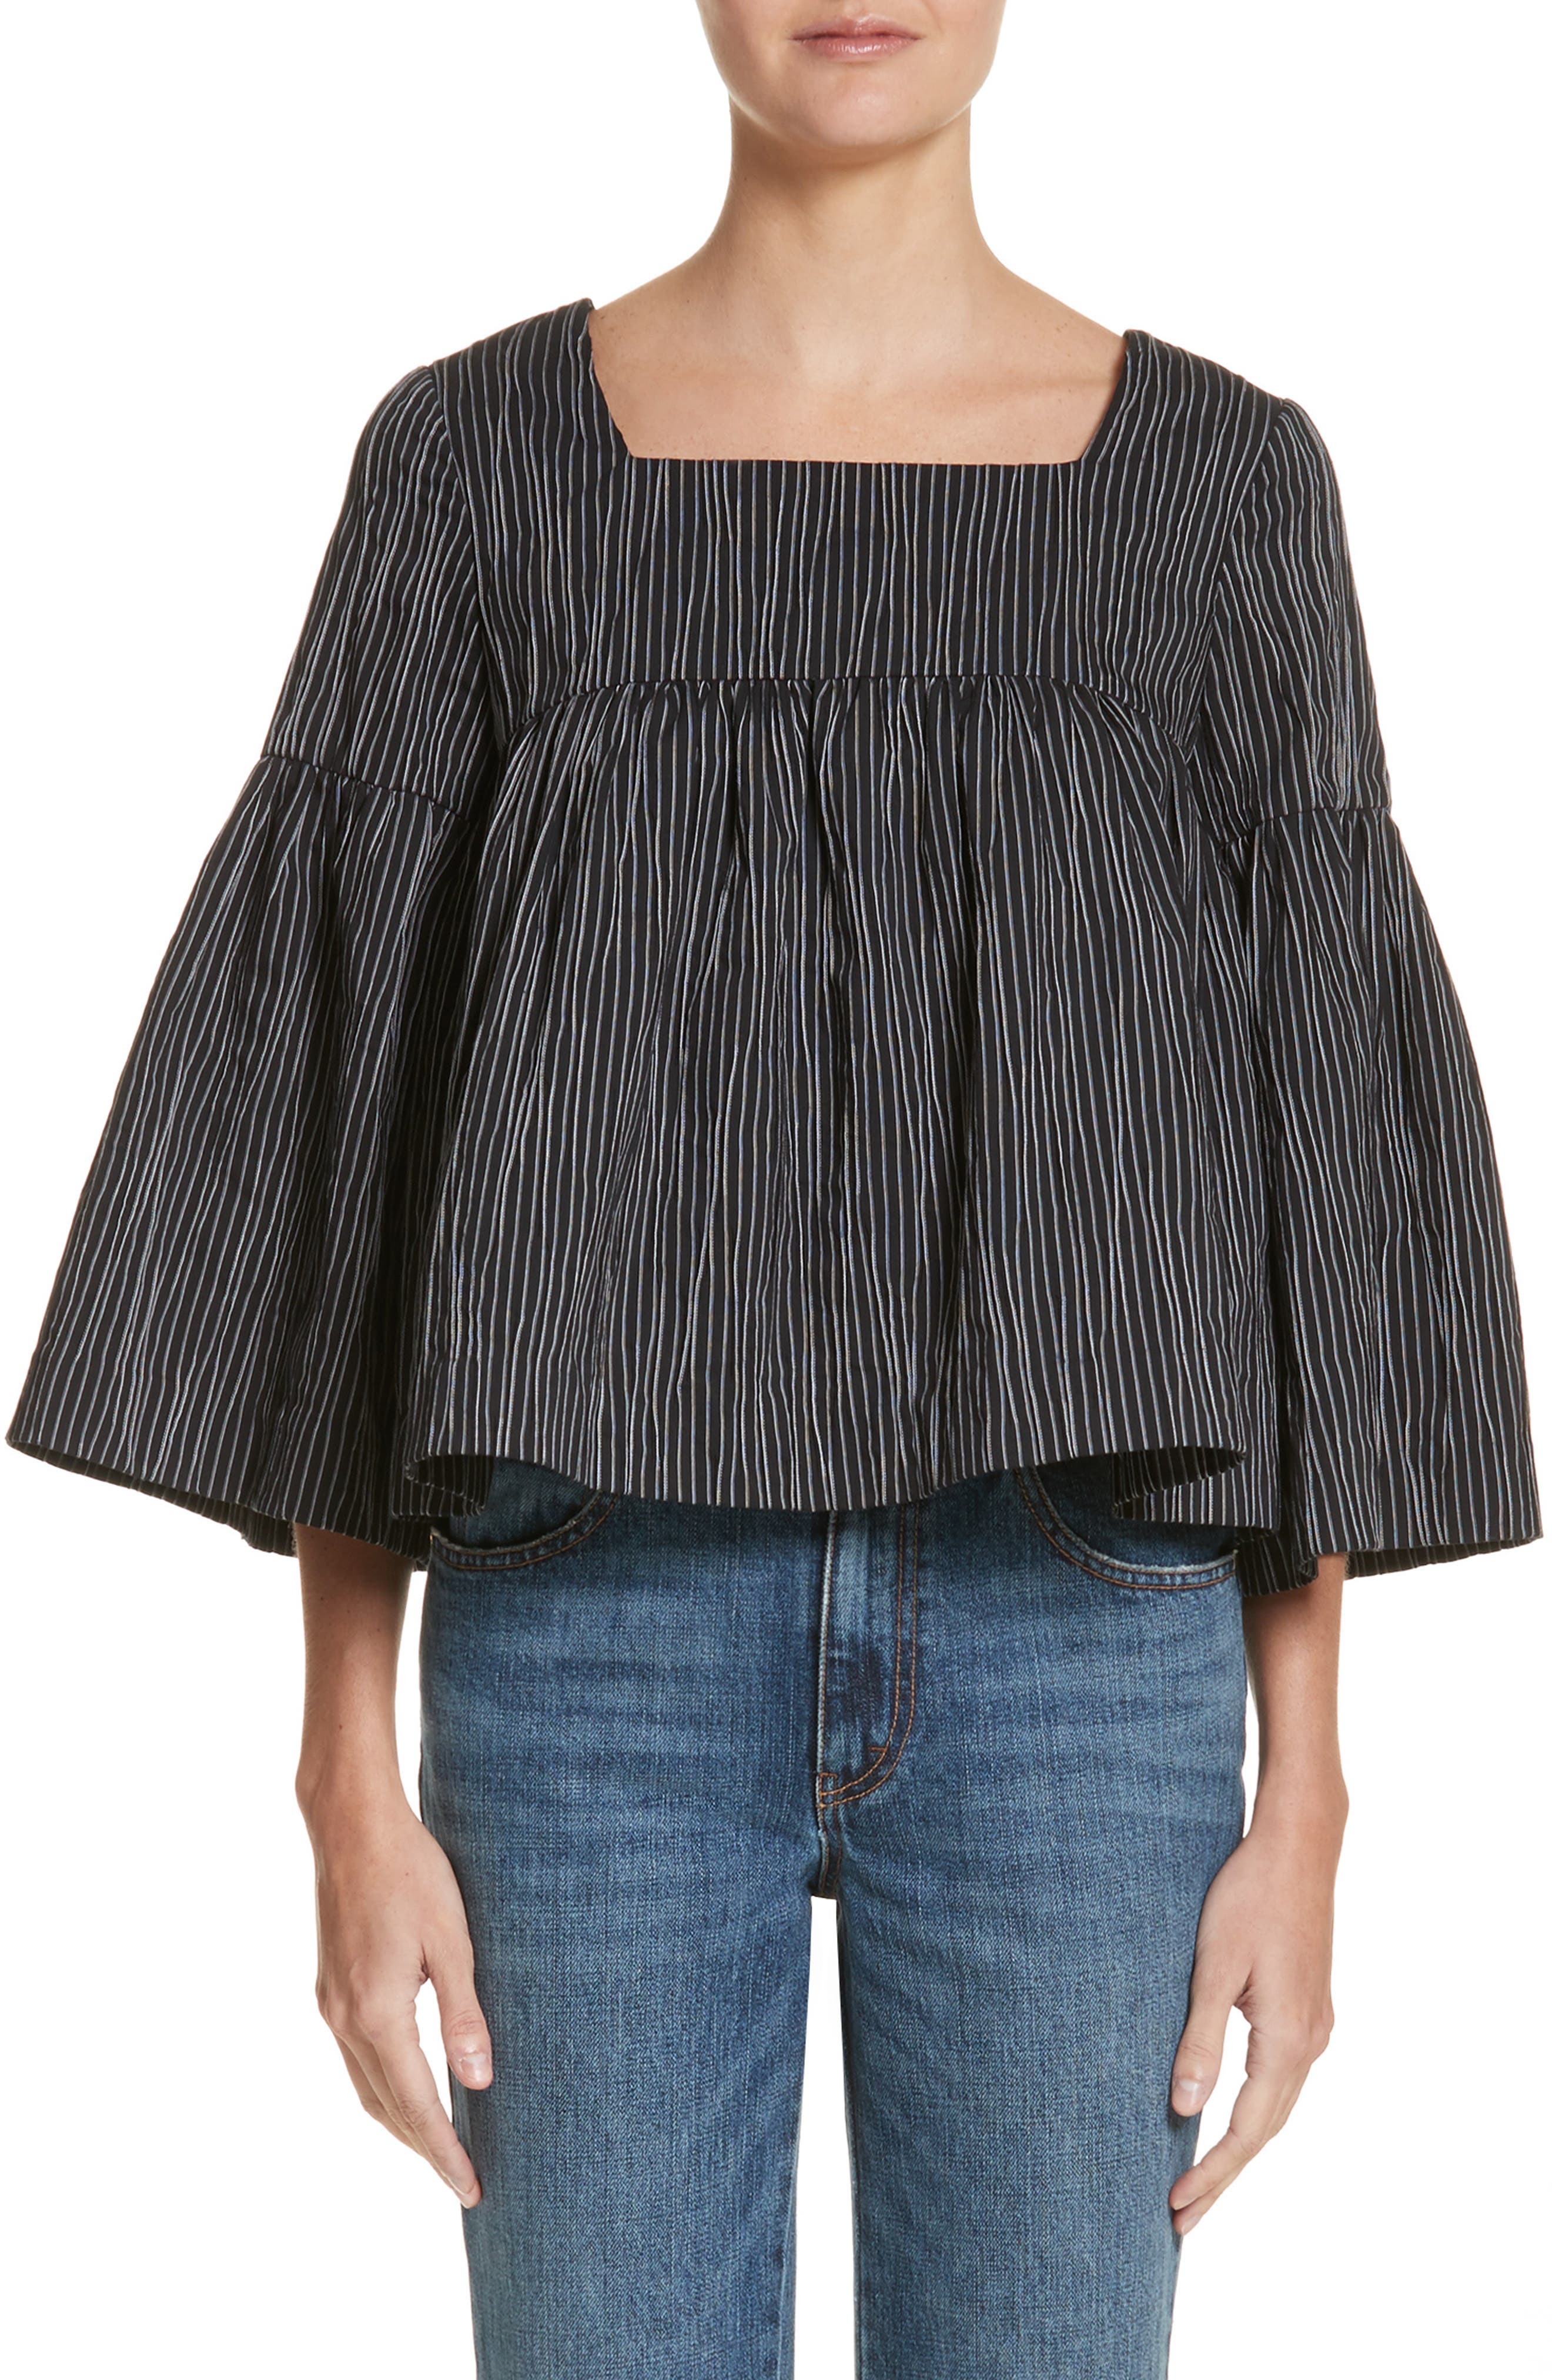 Stripe Crinkle Cotton Blend Swing Top,                         Main,                         color, Black/ White Stripe